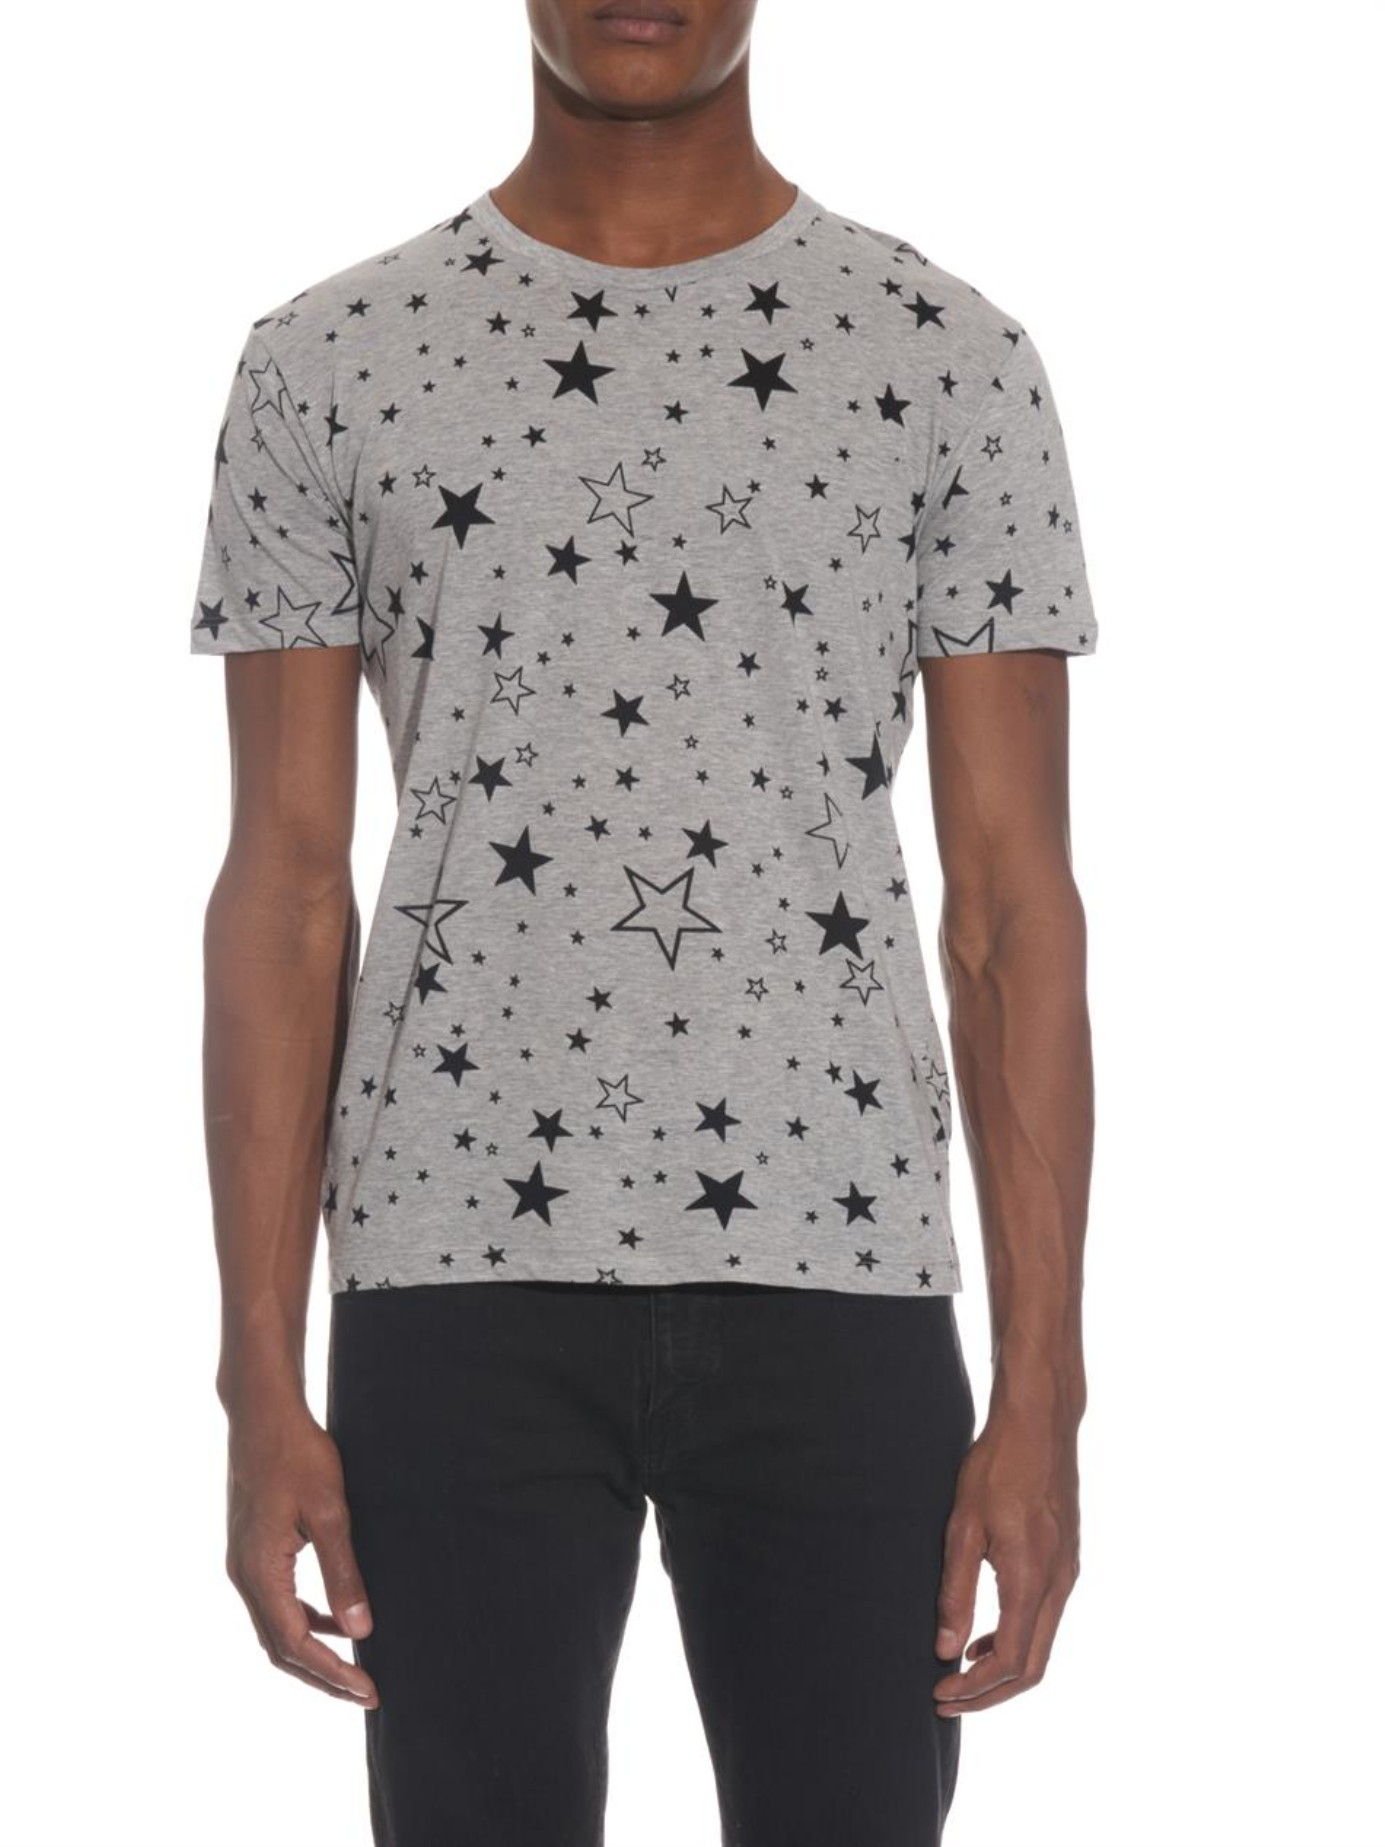 saint laurent star print t shirt in gray for men lyst. Black Bedroom Furniture Sets. Home Design Ideas